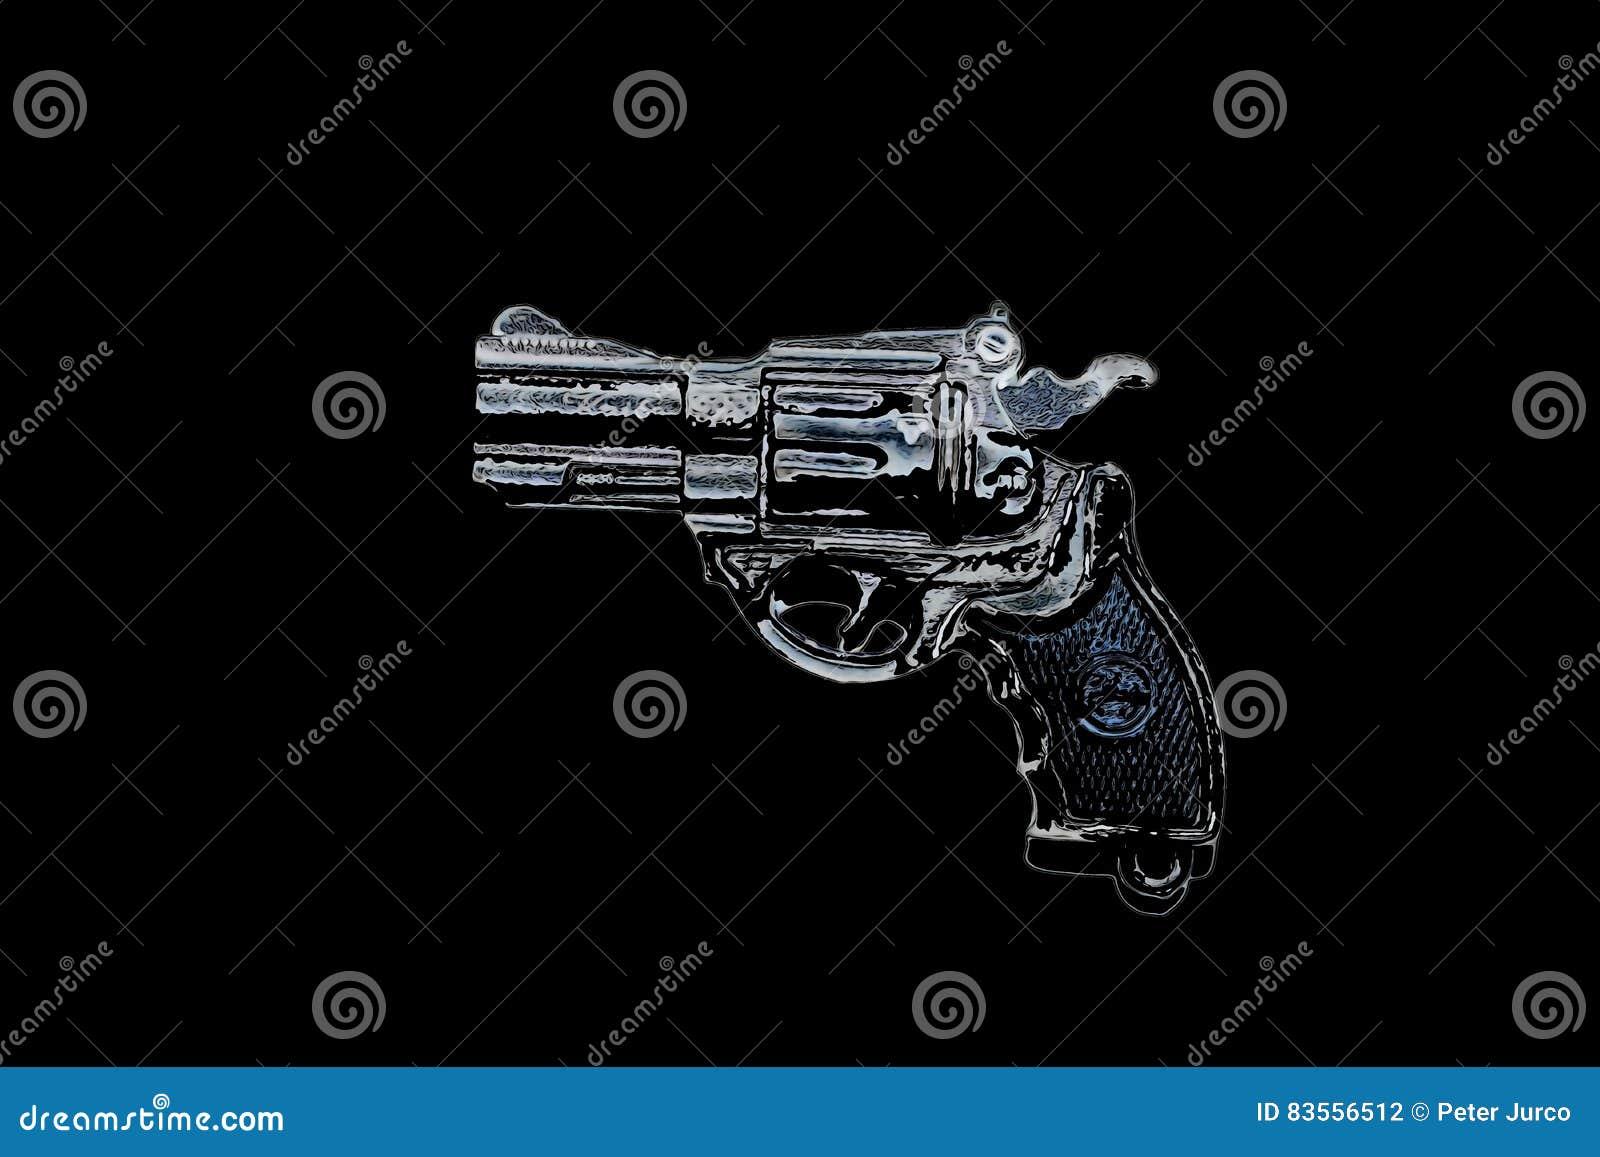 Small gun - model